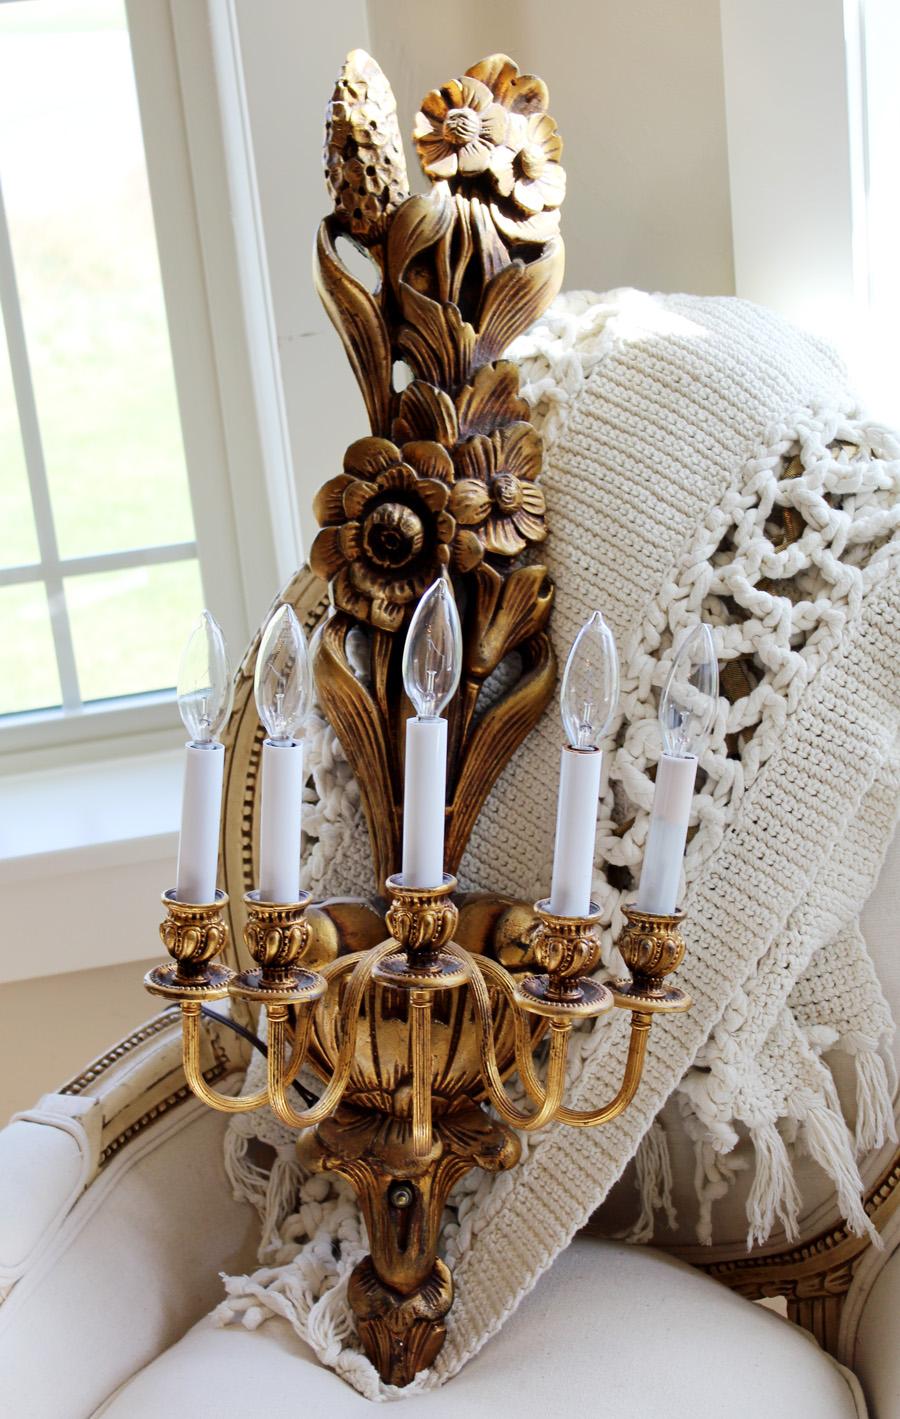 Antique Wall Candelabra Sconce Chandelier Gorgeous Details-